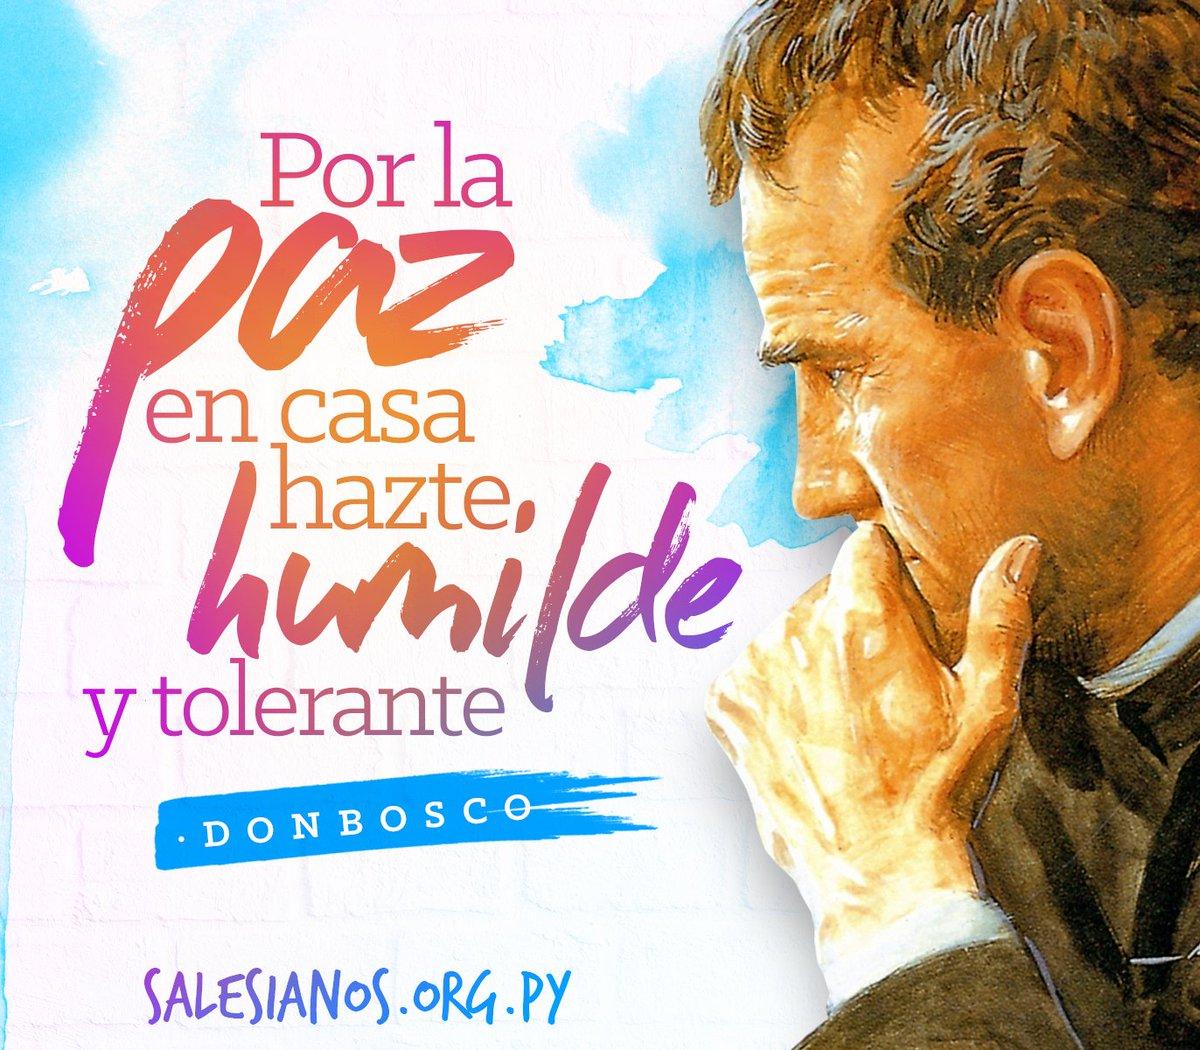 Frases De Don Bosco On Twitter Por La Paz En Casa Hazte